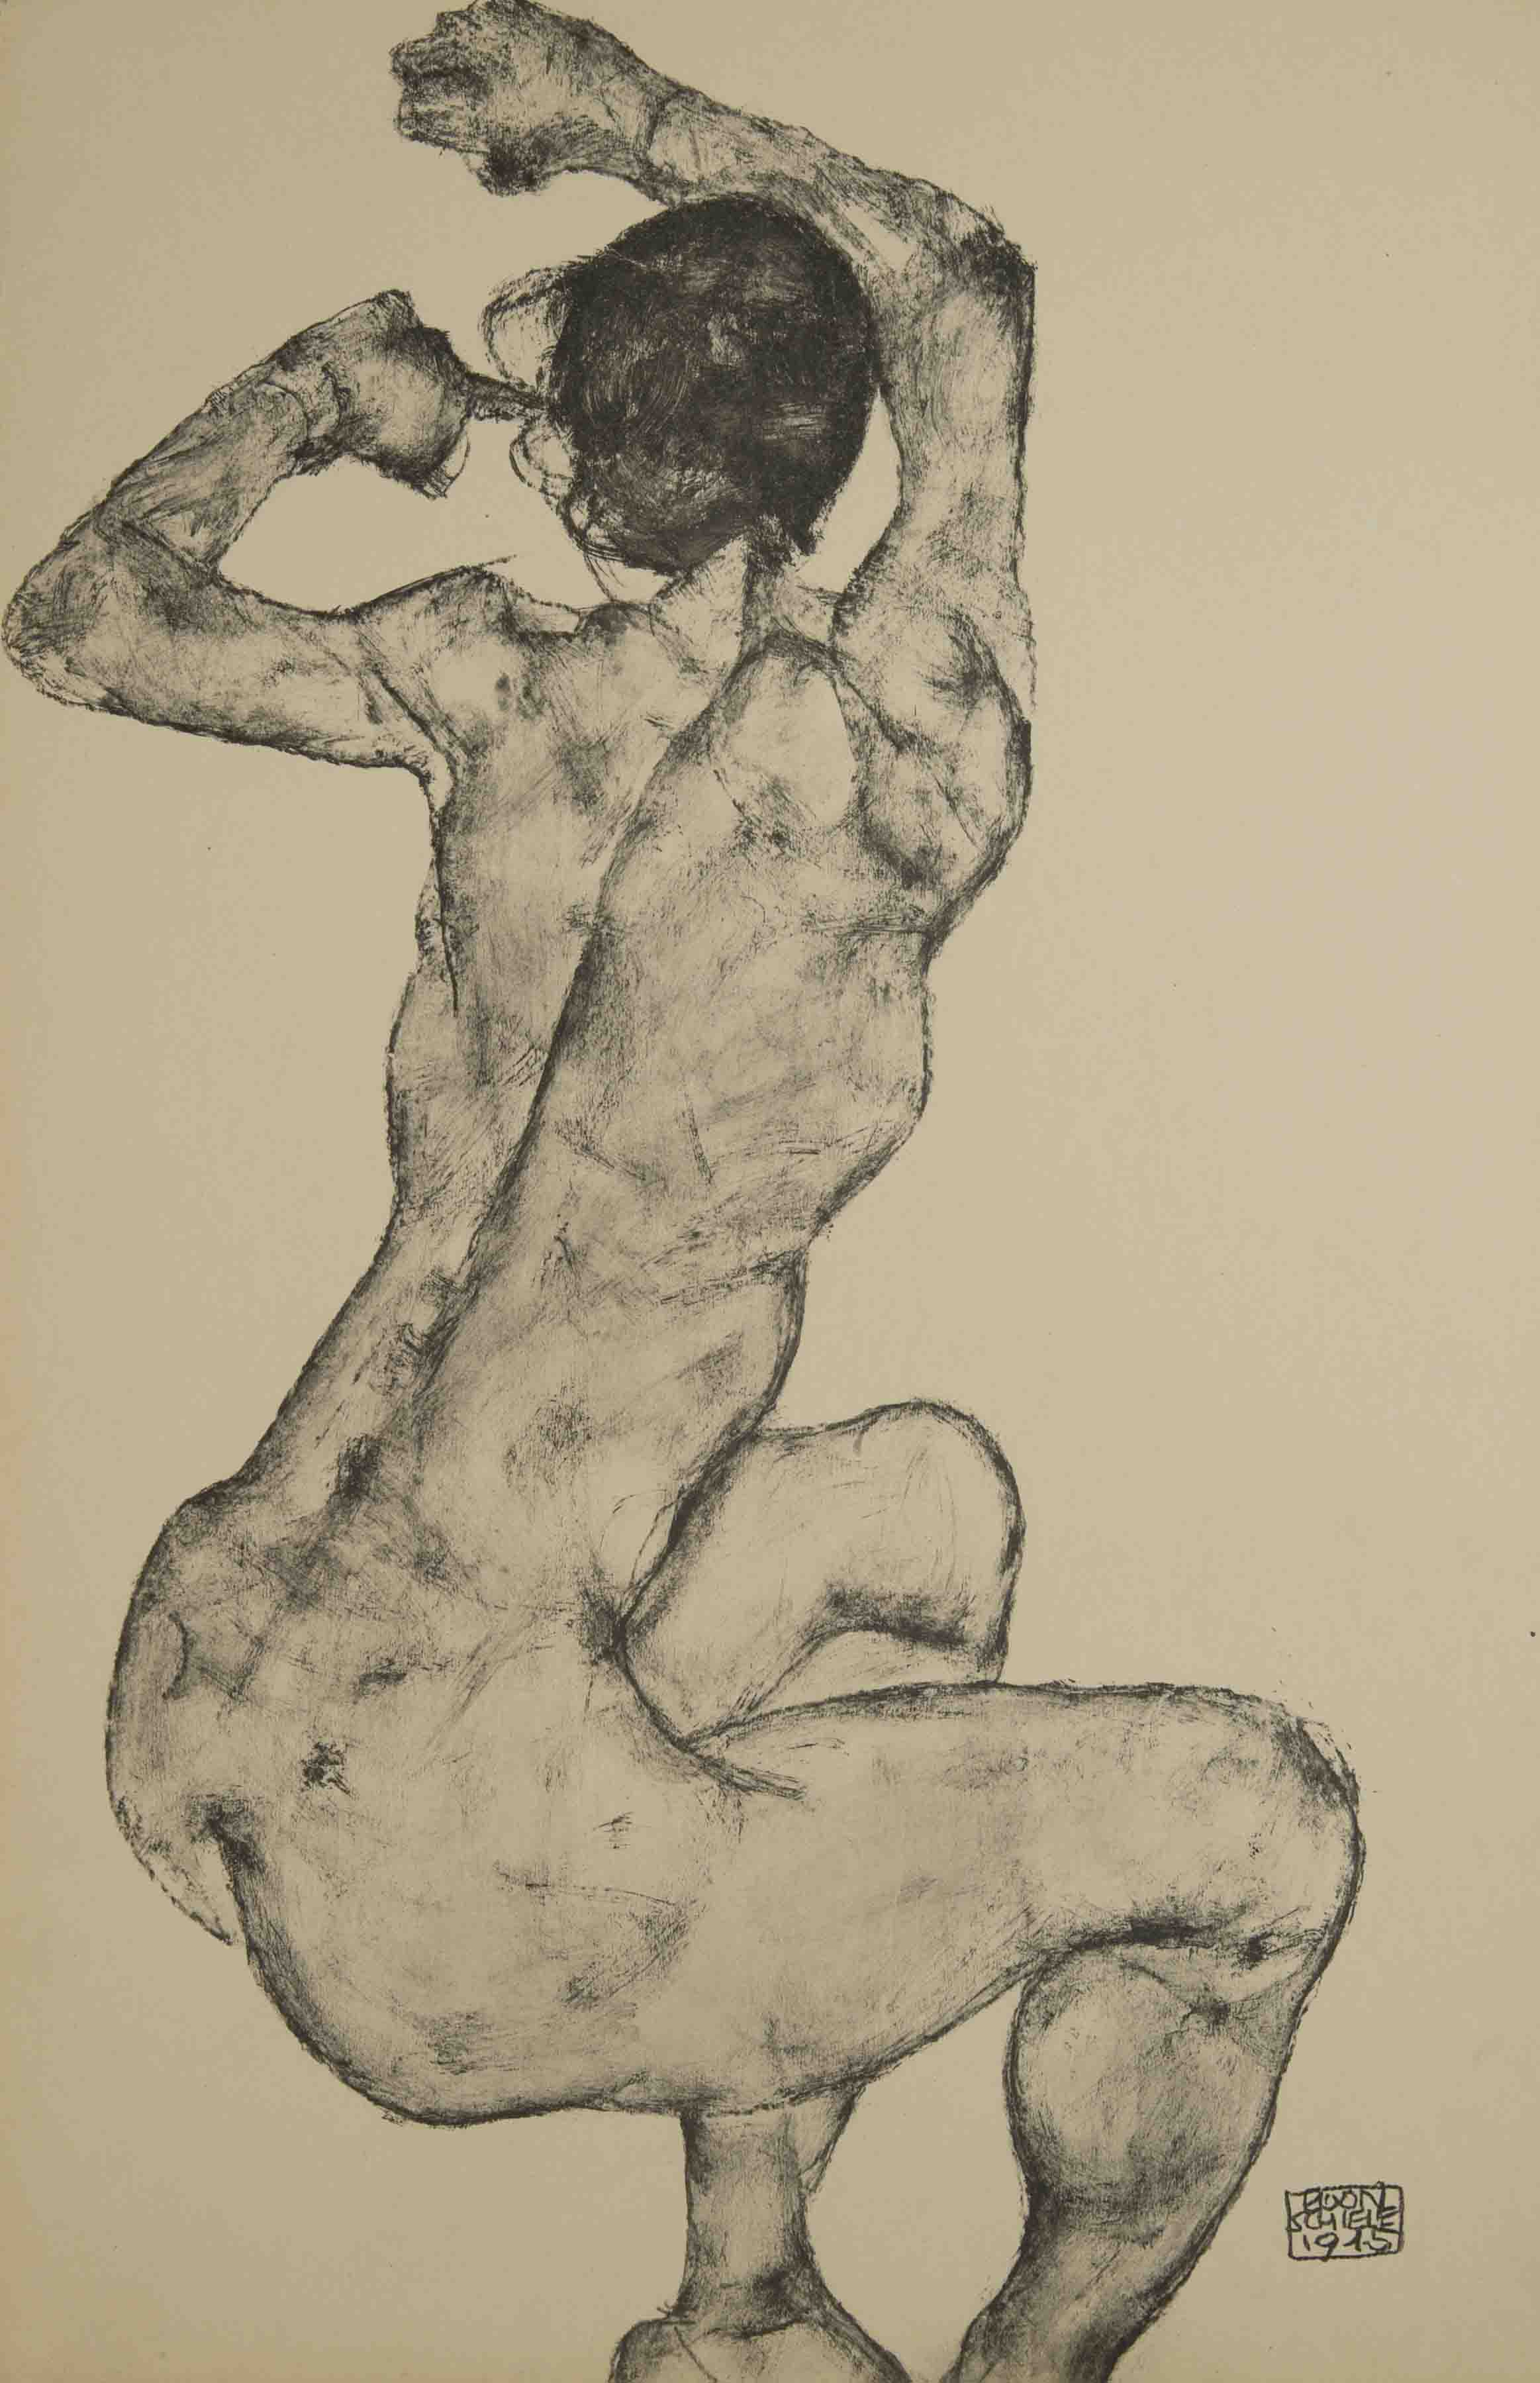 Egon Schiele - nude, From the portfolio Zeichnungen (drawings),1915 incluing 12 Heliotypes, Ed° Librairie Richard Lanyi,Vienne, 1917.